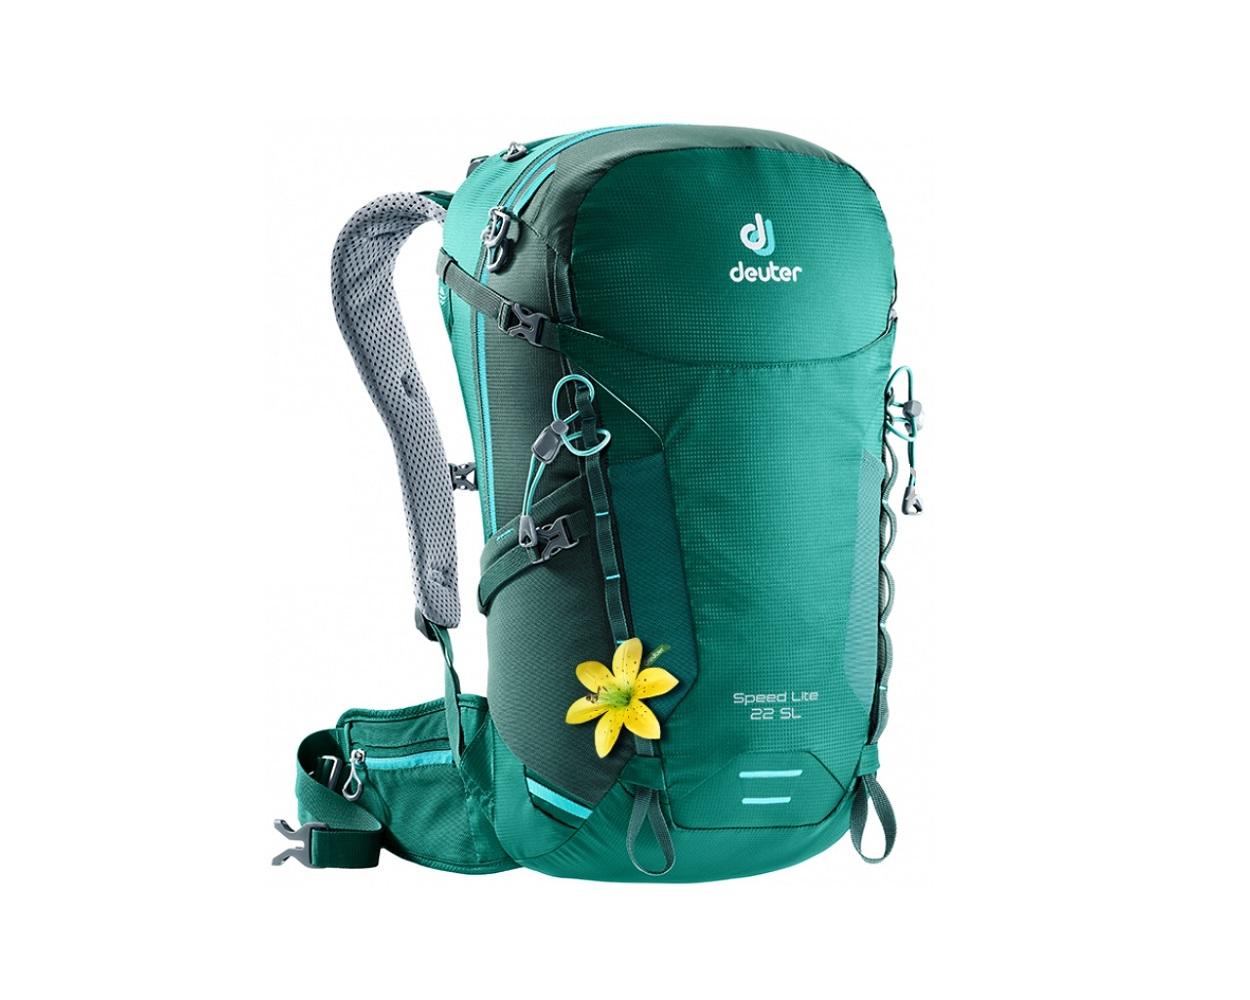 Рюкзак Deuter 2018 Speed Lite 22 SL alpinegreen-forest, Женские рюкзаки - арт. 1035950288